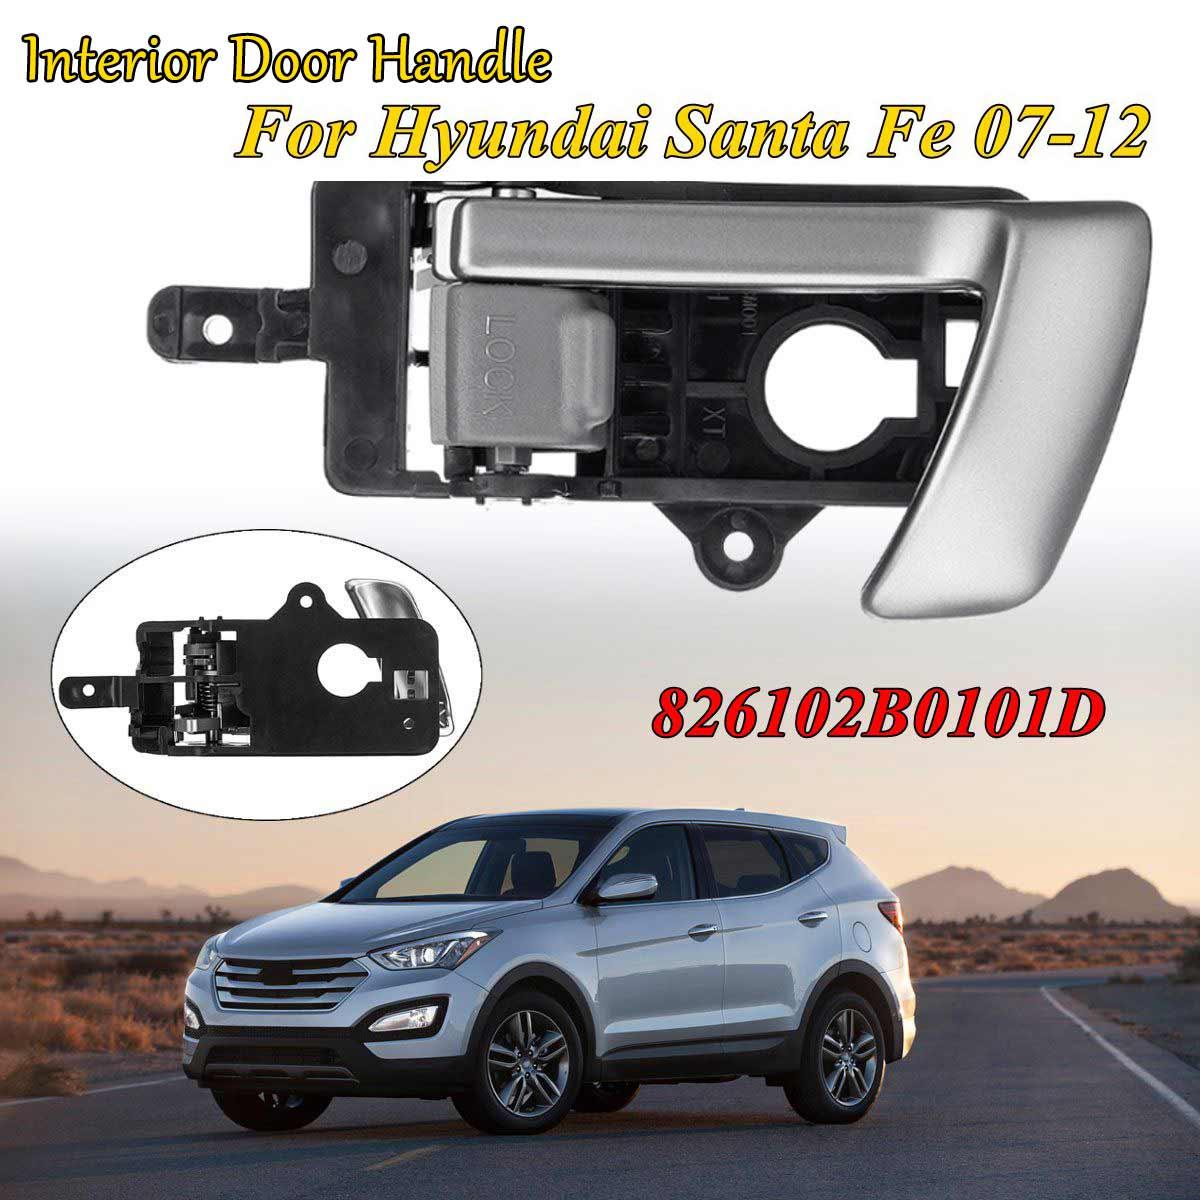 NEW OEM For 2007-2012 Hyundai Santa Fe RIGHT FRONT Door Handle Base Plate